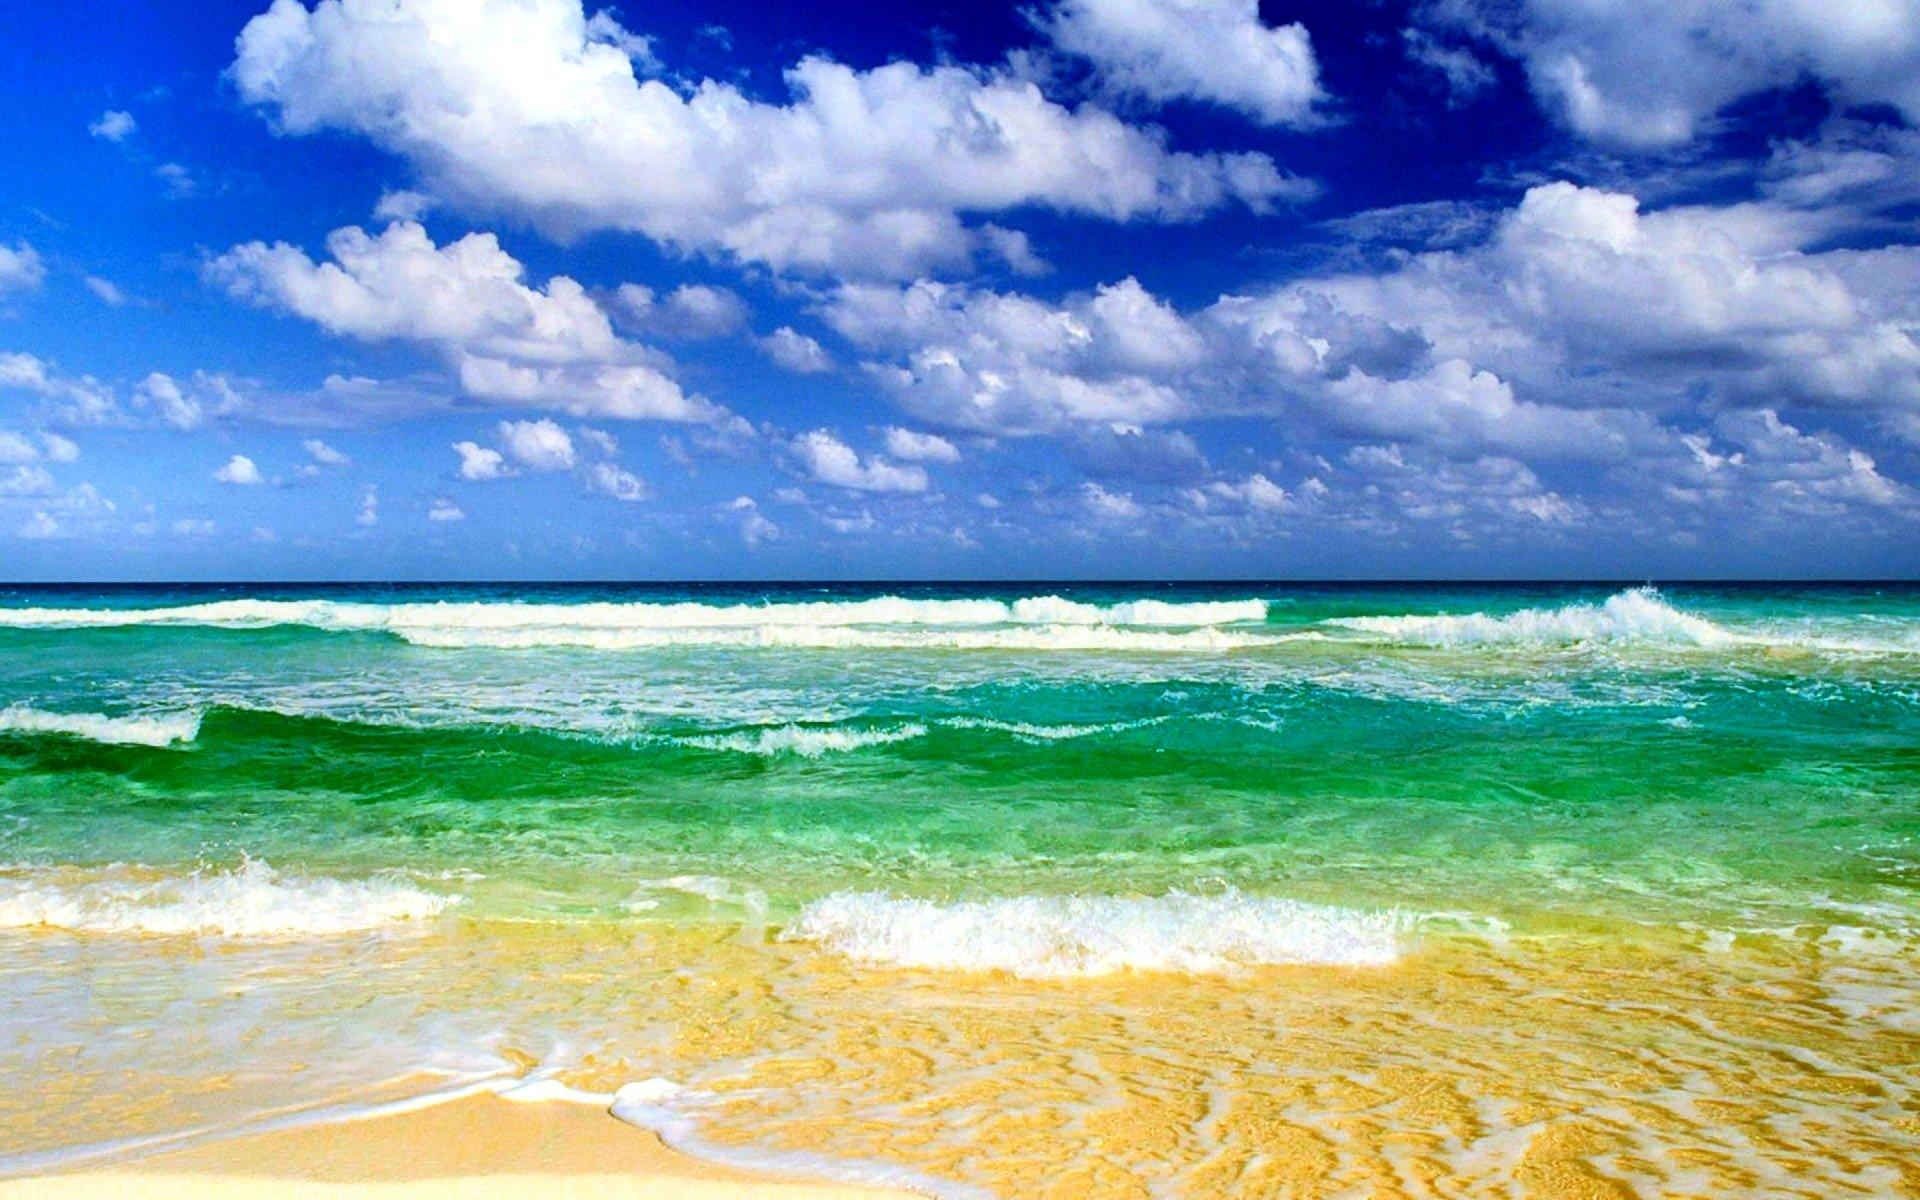 Earth - Beach  Wave Horizon Sea Cloud Summer Sunny Wallpaper